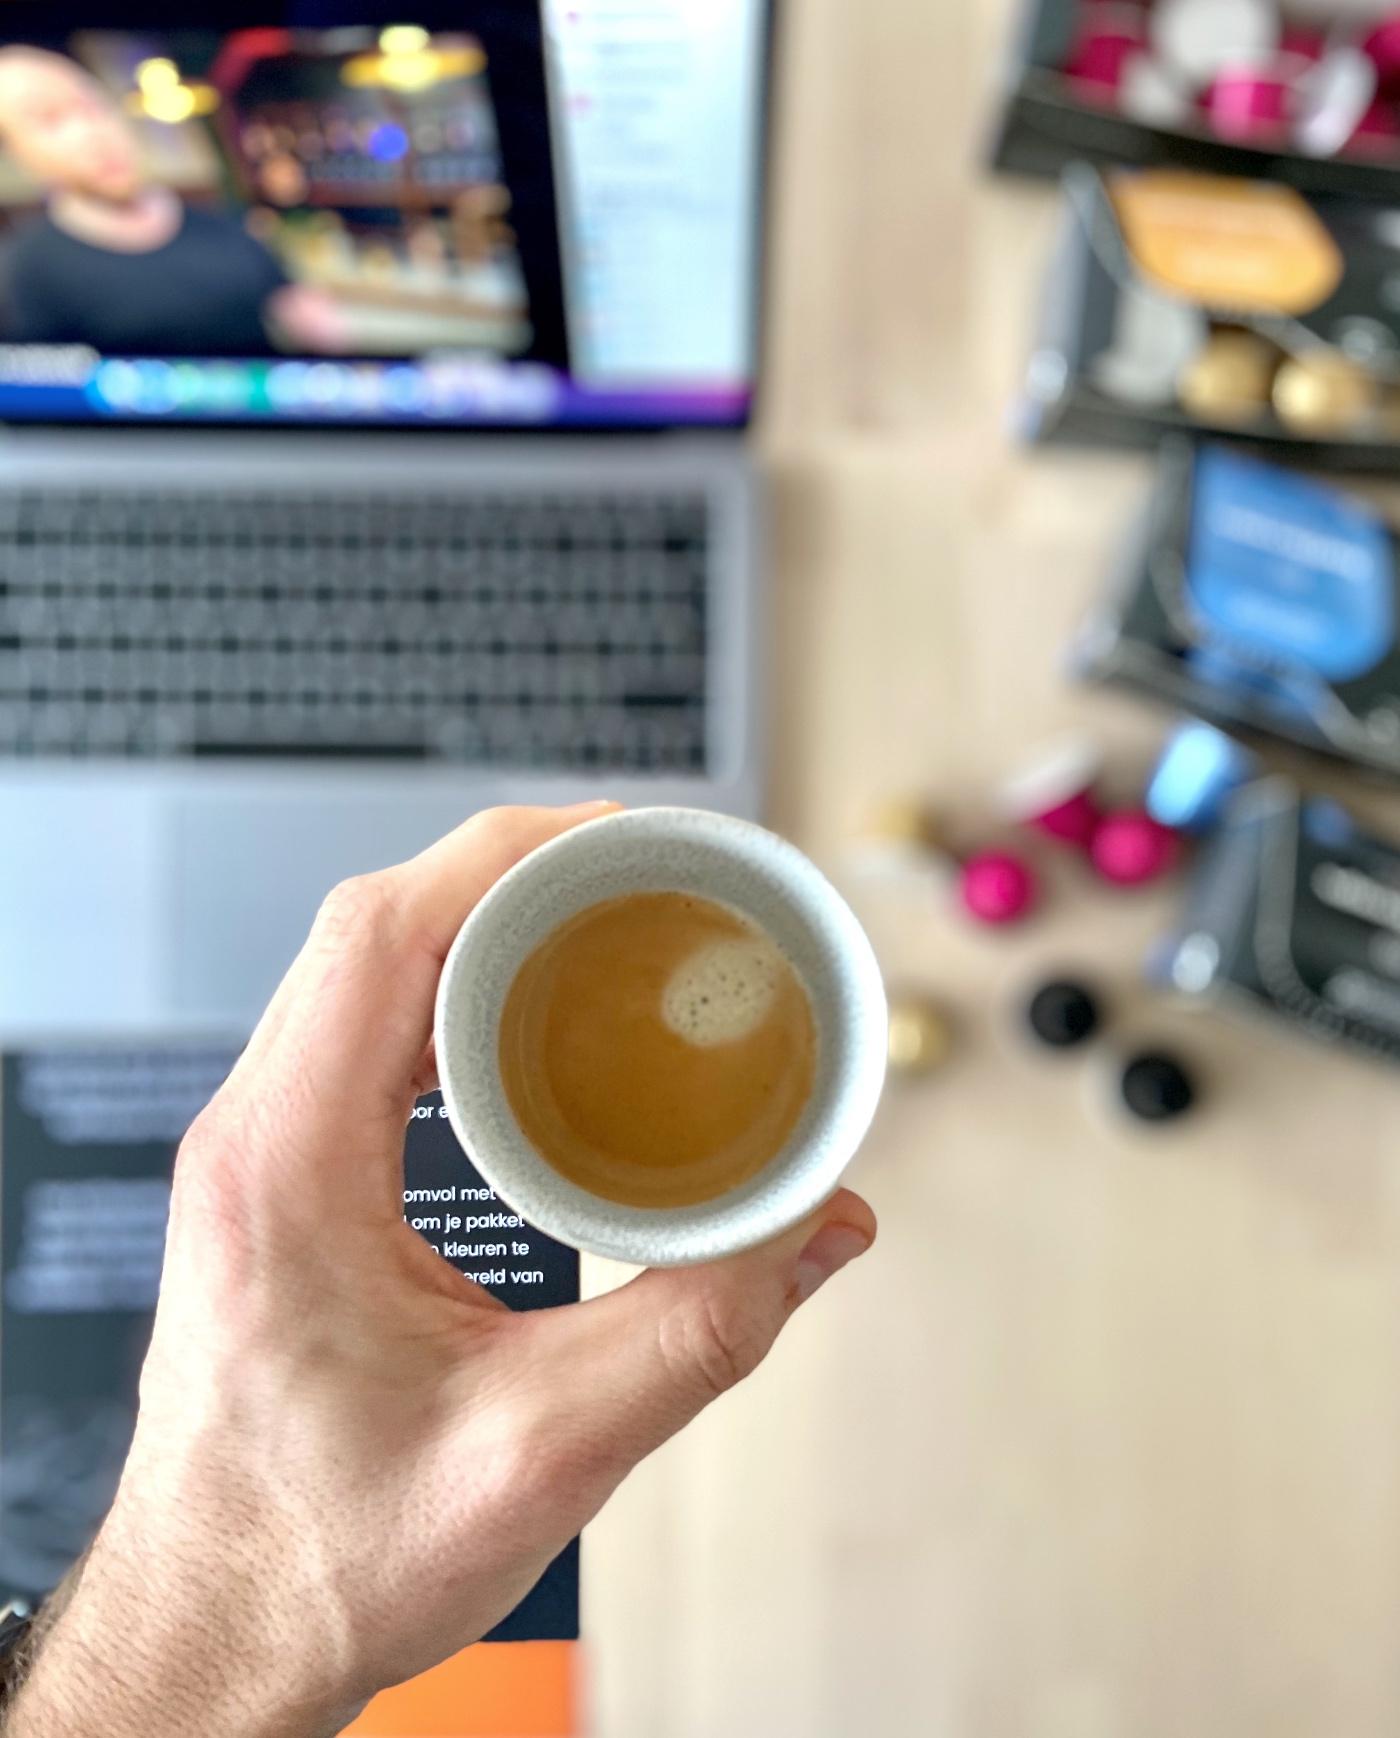 Blokker koffiecapsules